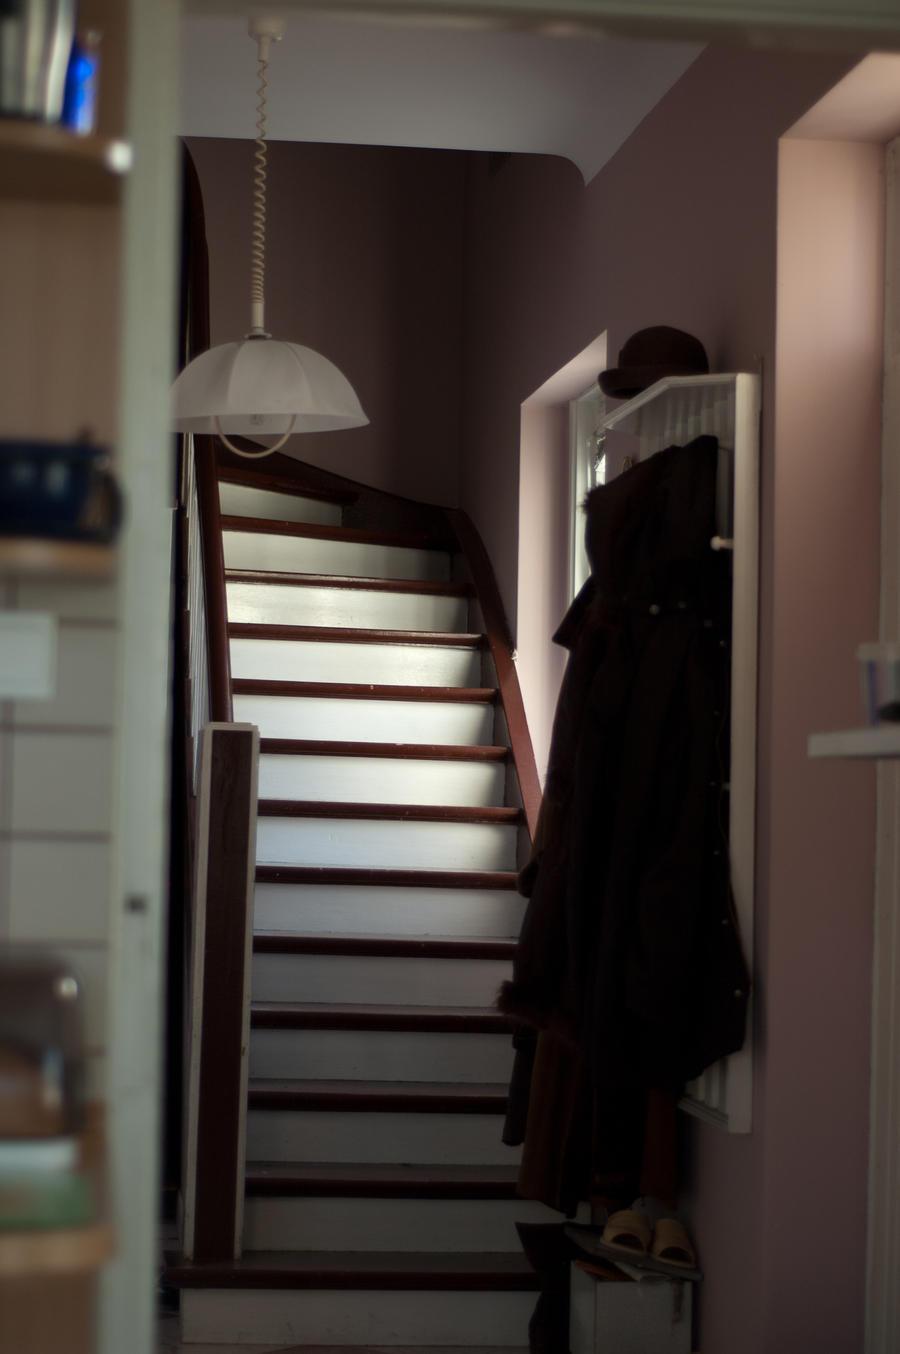 Stairs by sirlatrom